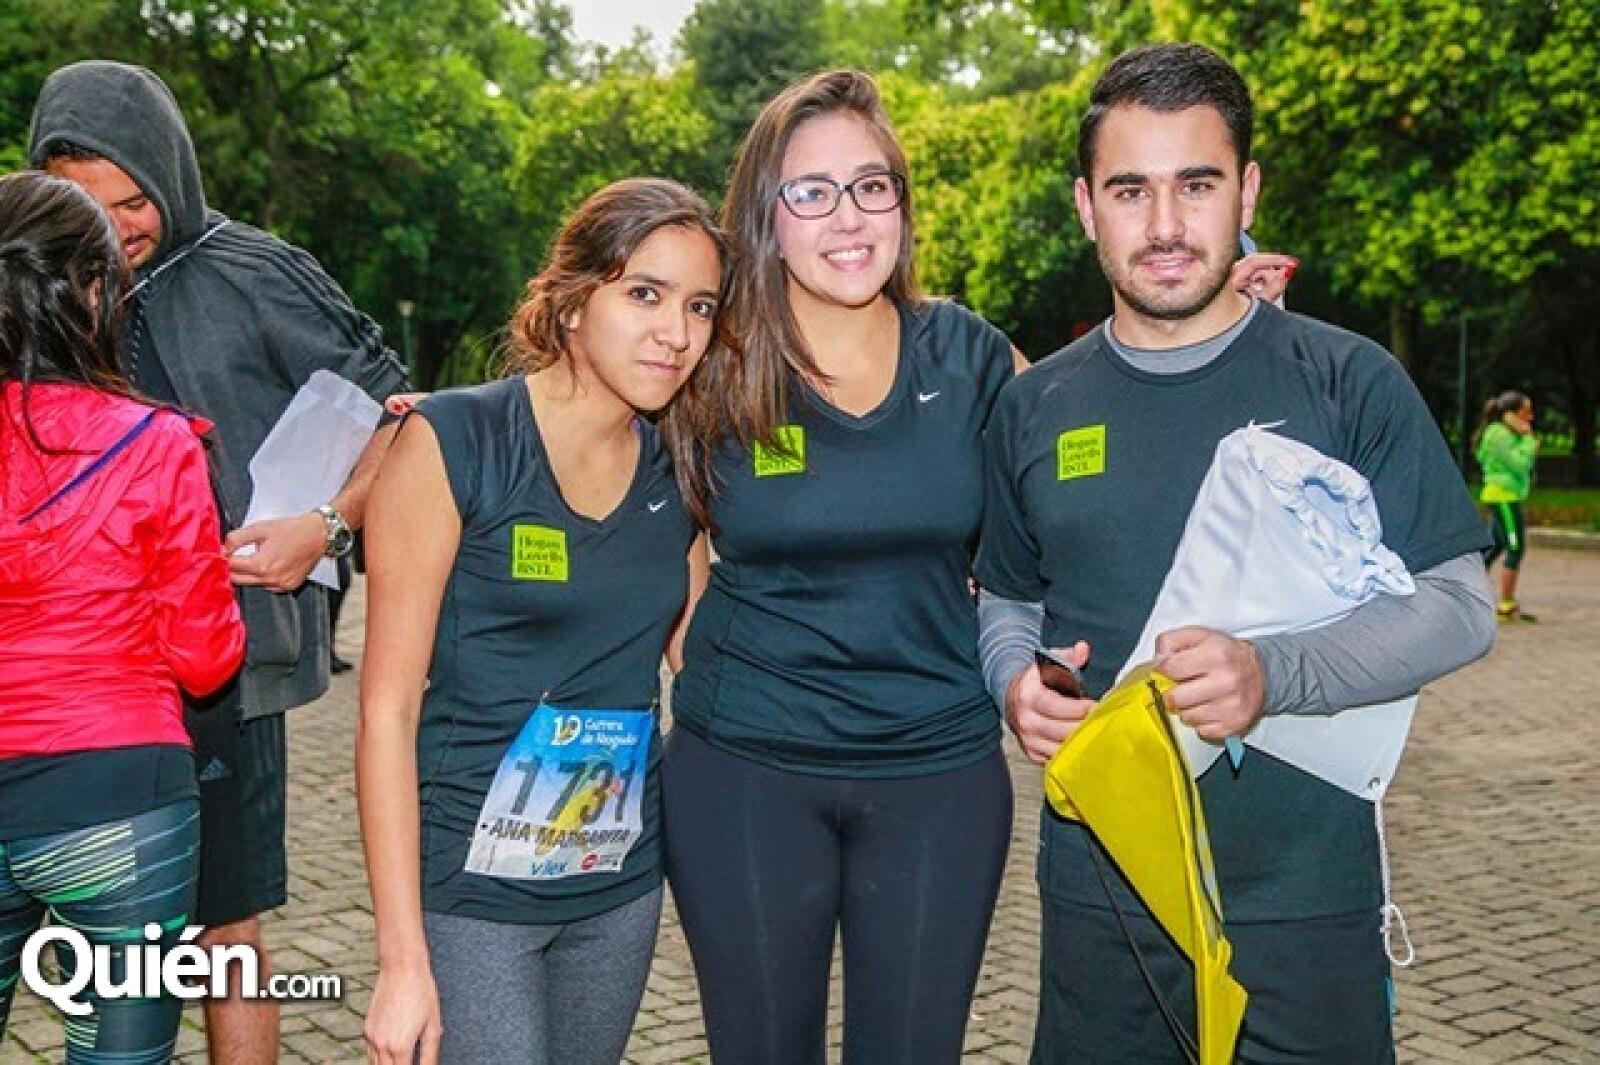 Ana Jiménez,Mariana Larrea y Rogelio Gamba